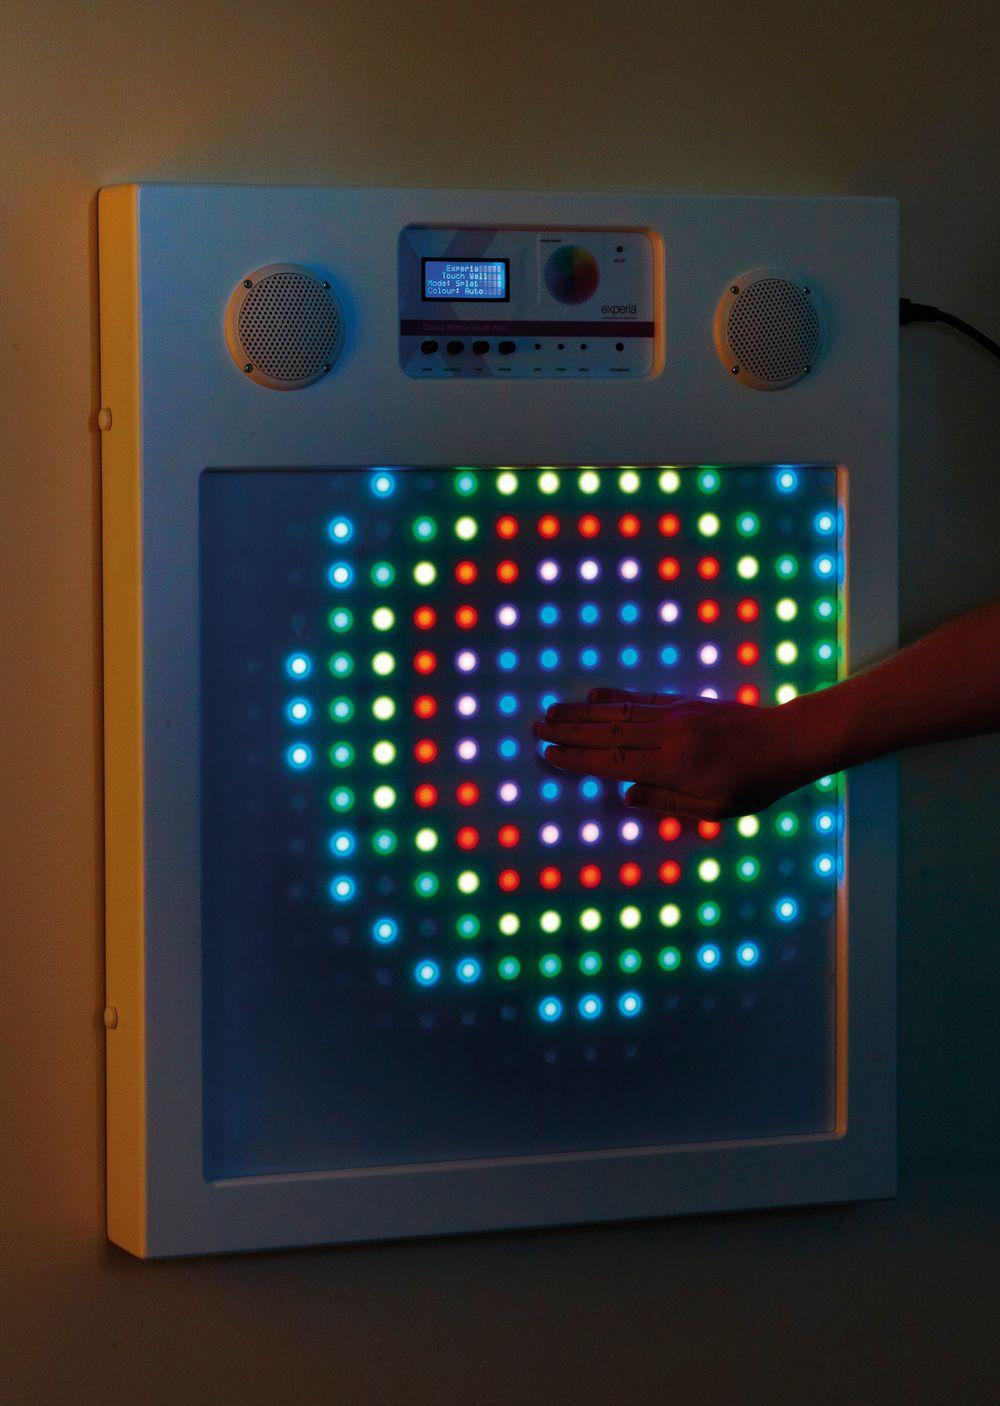 IRis Musical Touch Wall, trovare un senso giocando